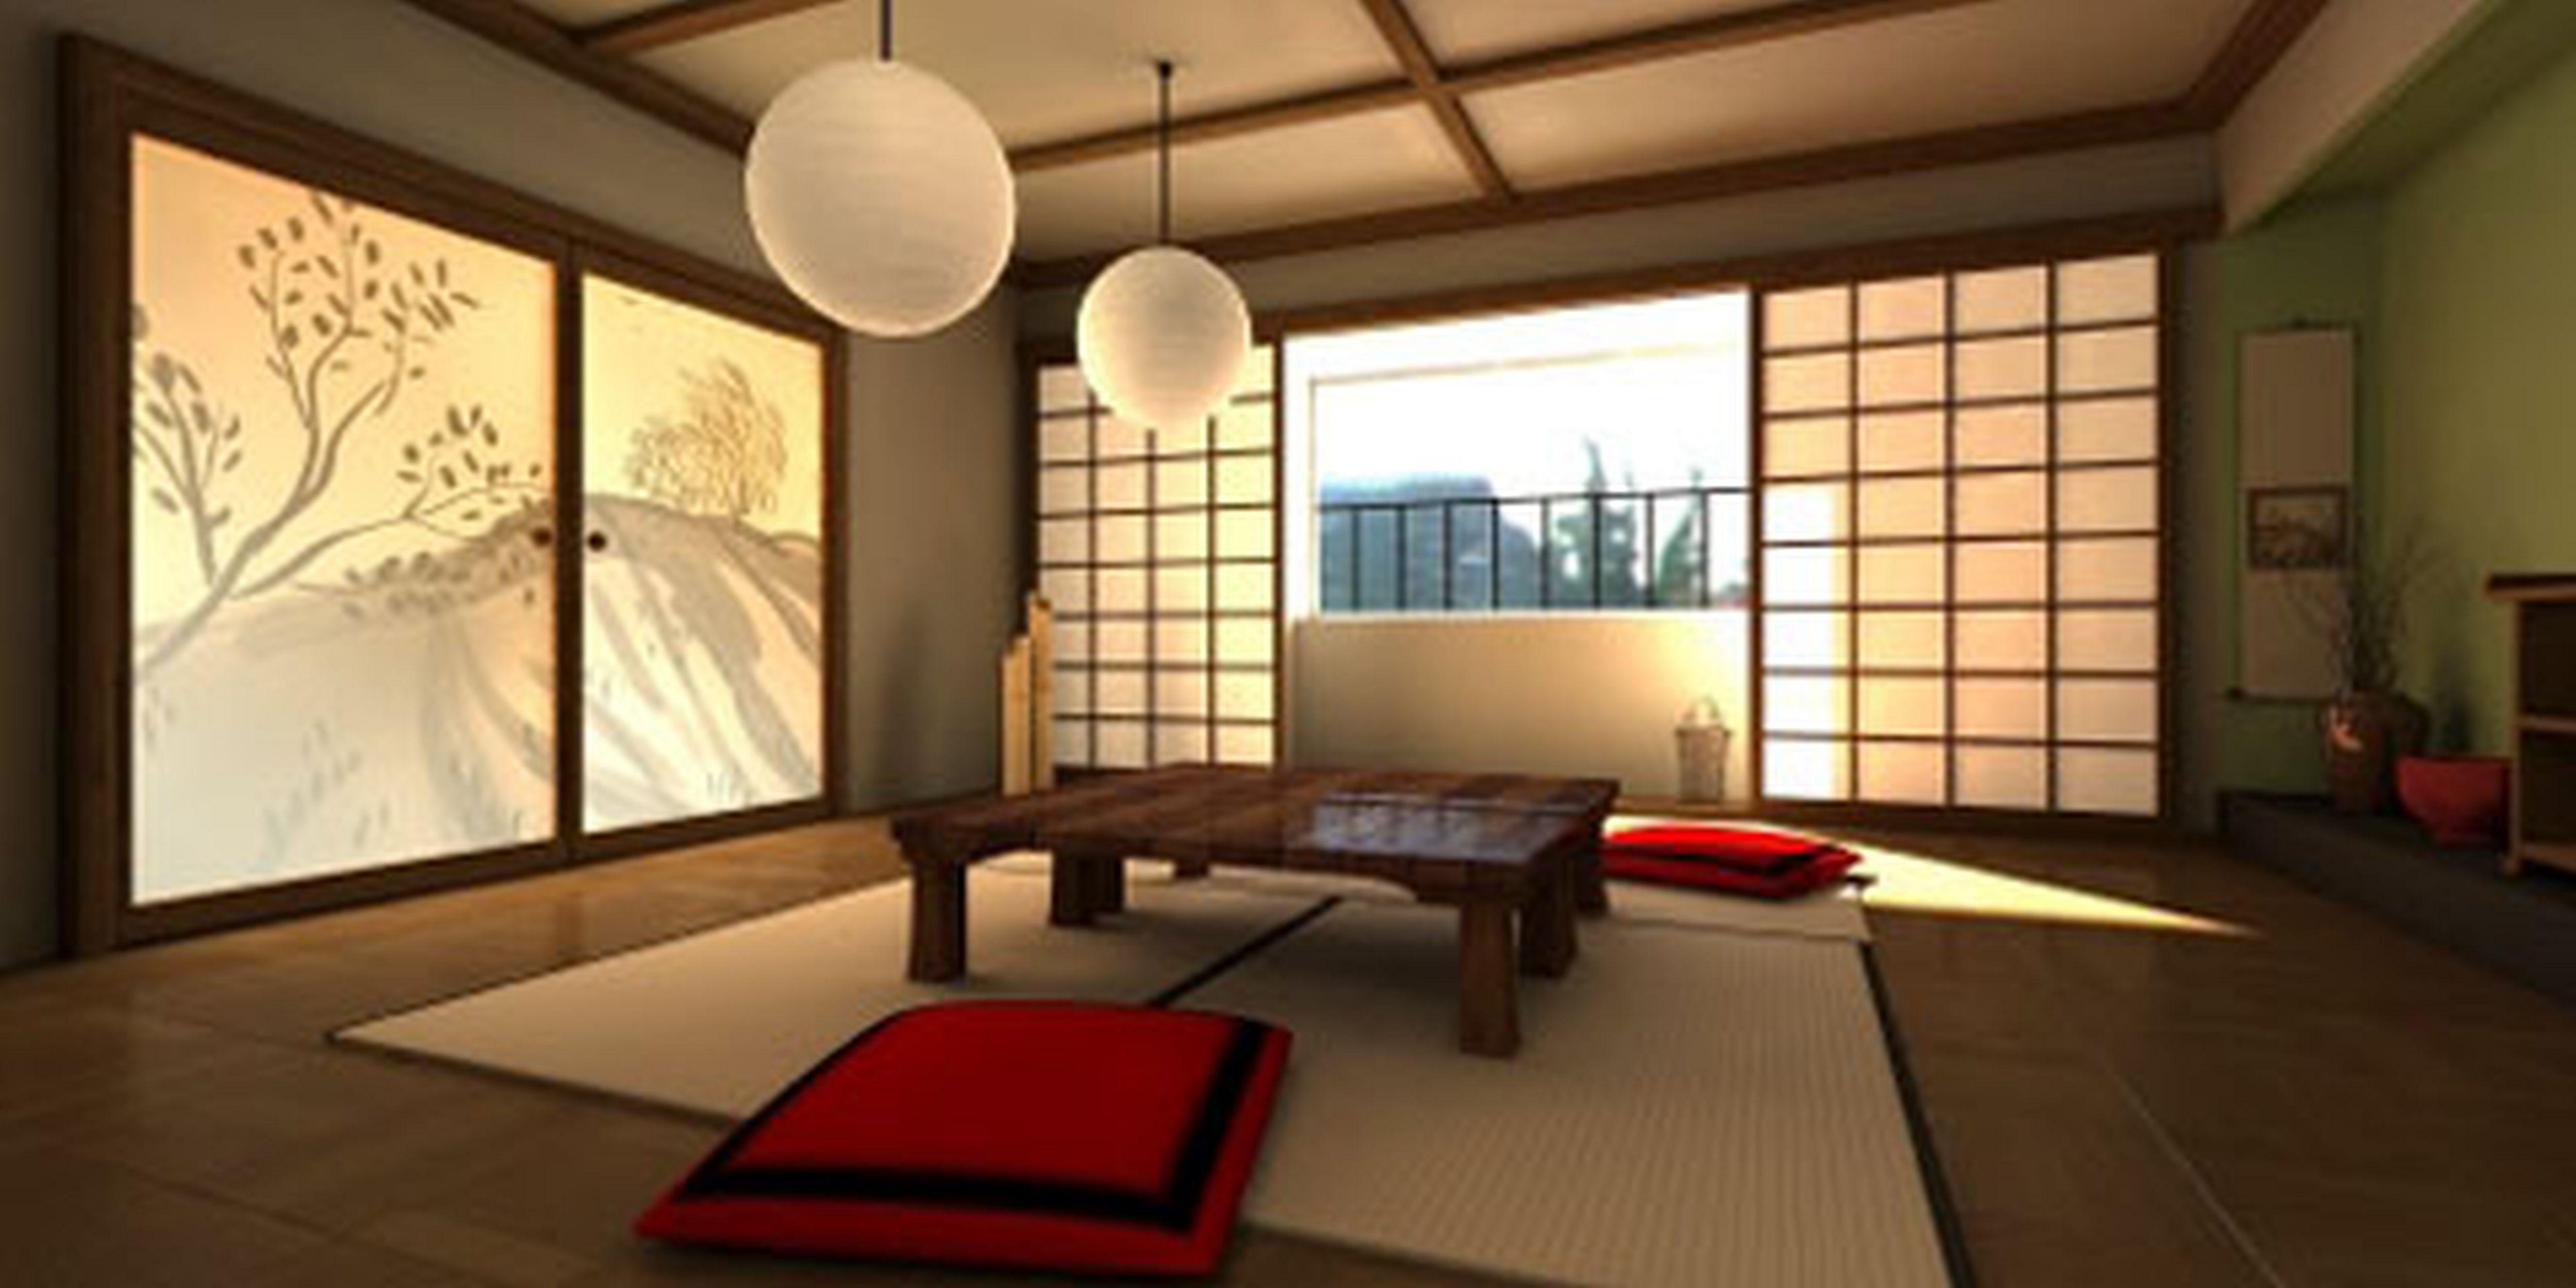 15 Impressive Apartment Living Room Decorating Ideas On A Budget Japanese Home Design Japanese Interior Design Japanese Living Rooms